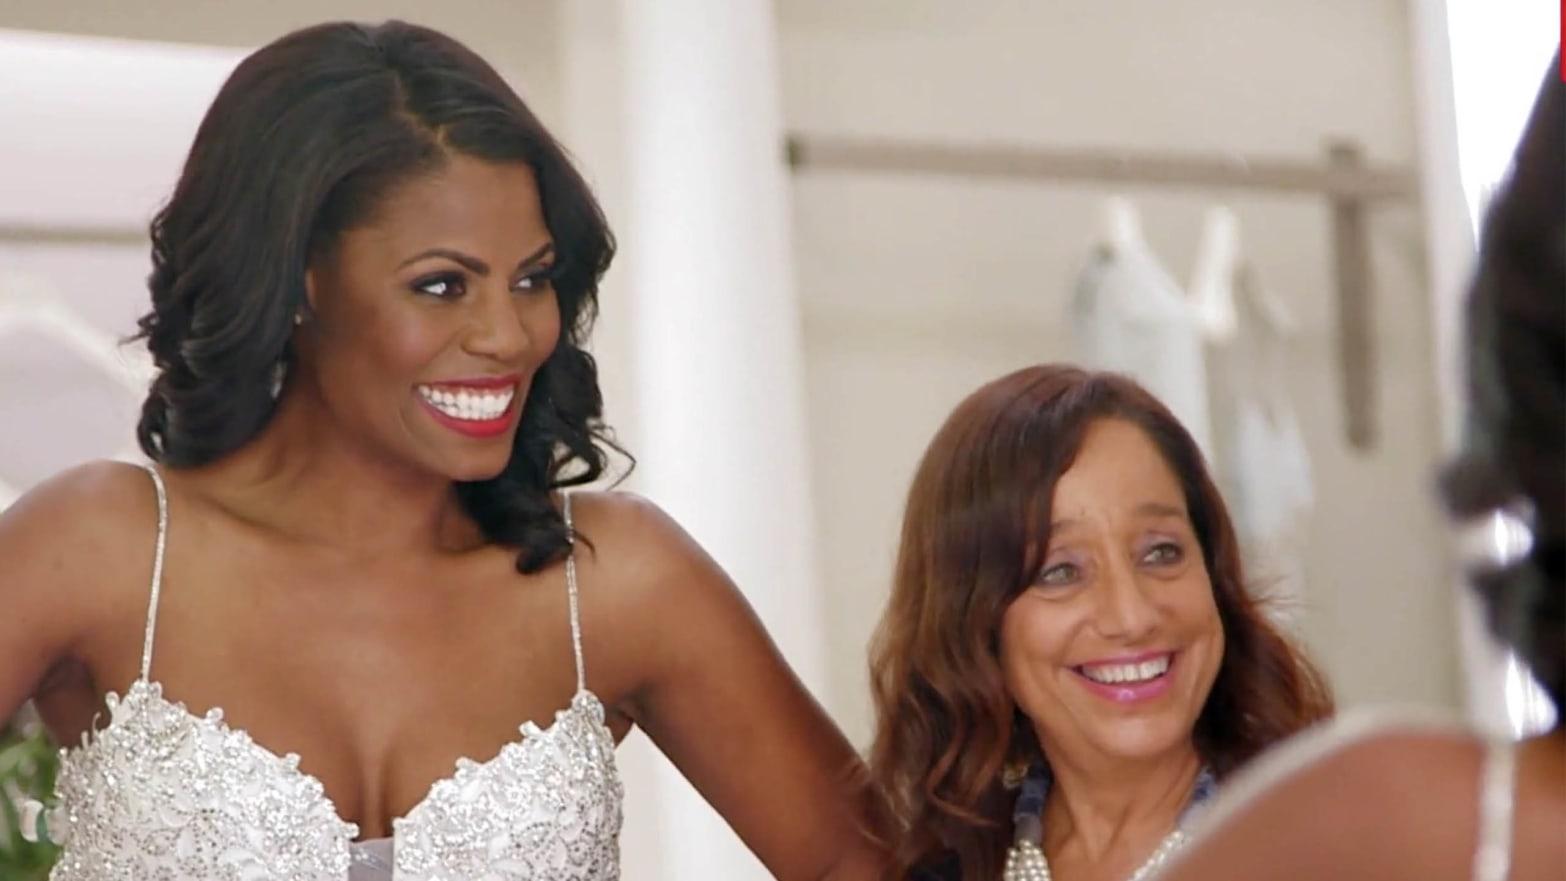 Omarosa Wedding Dress.Trump Staffer Omarosa Returns To Her Reality Tv Villain Ways